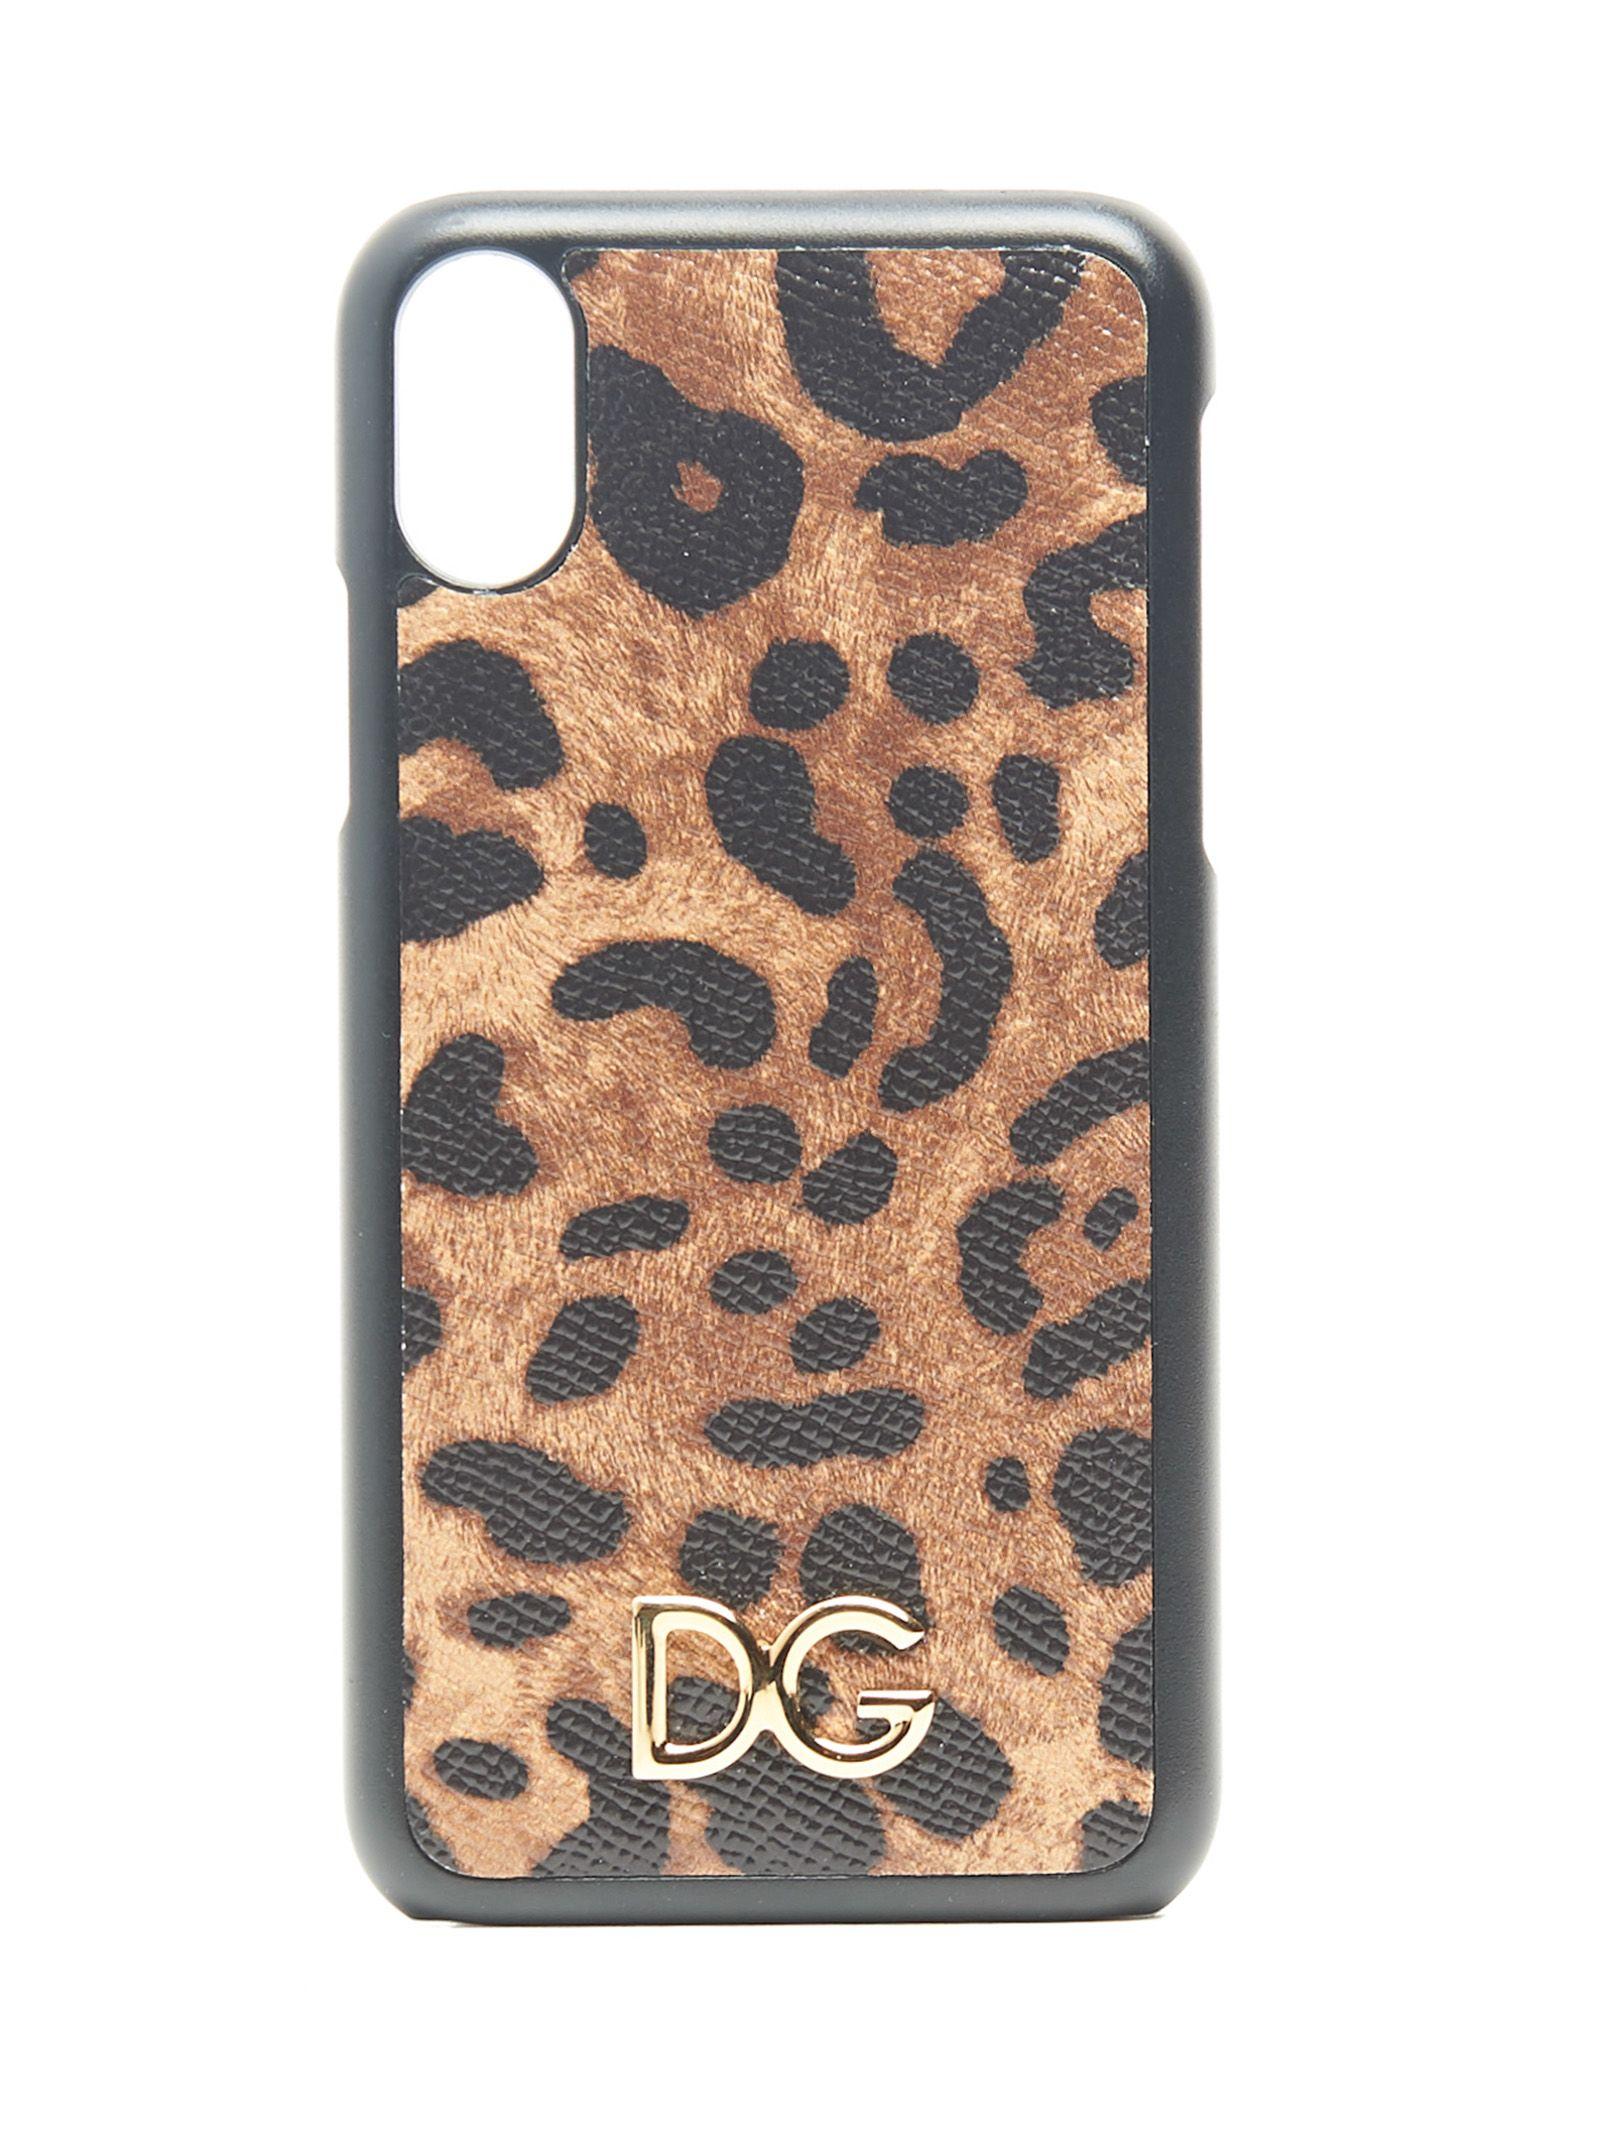 DOLCE & GABBANA IPHONE X CASE